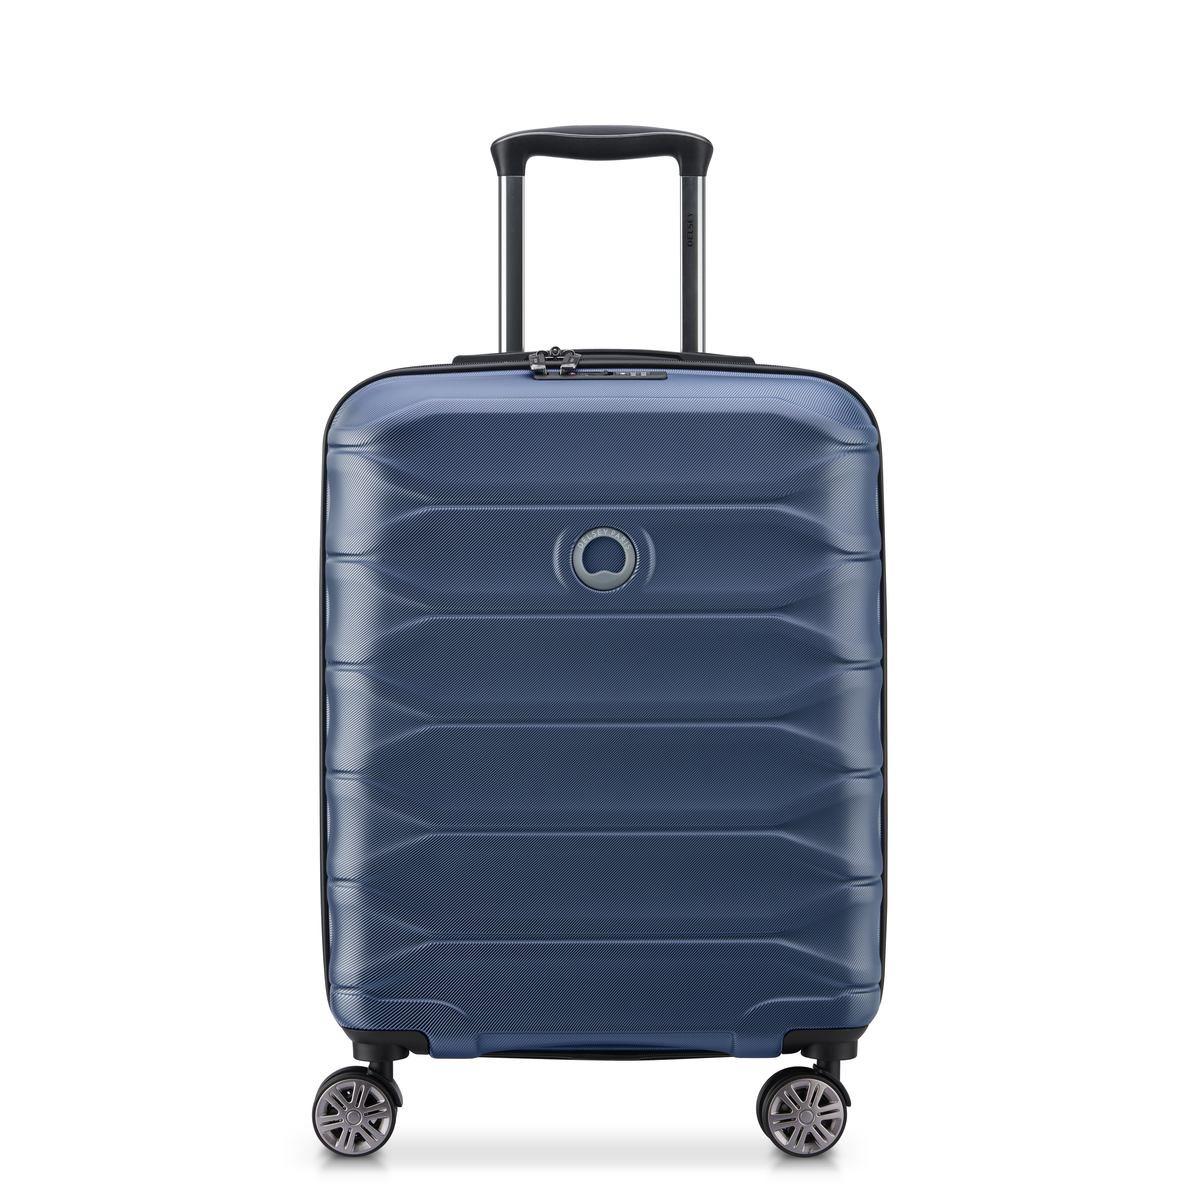 Delsey Βαλίτσα καμπίνας slim expandable 55x40x20/22cm σειρά Meteor Blue